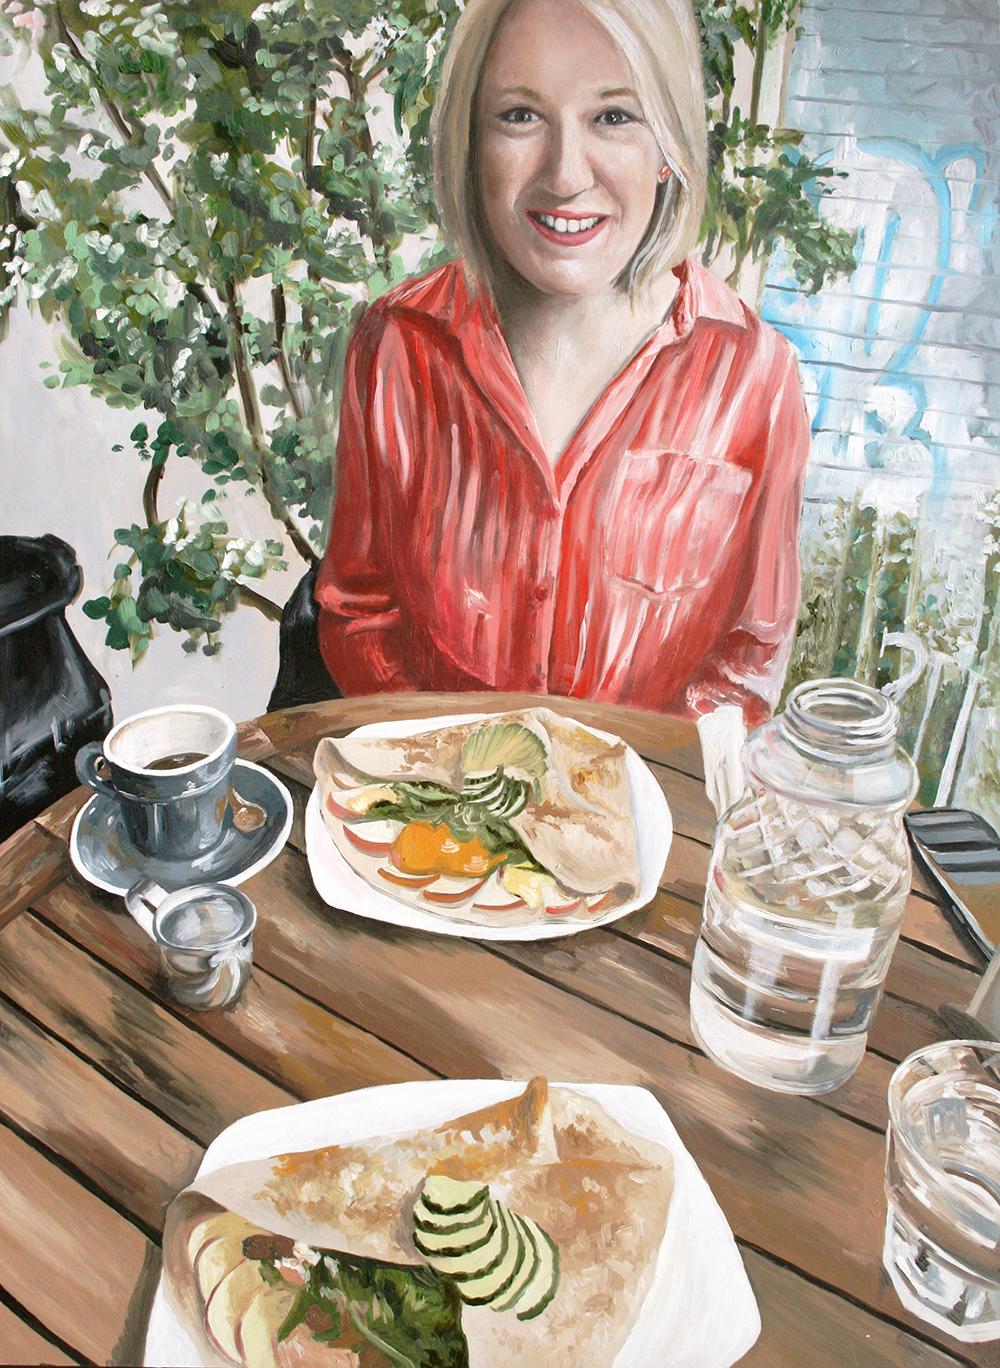 "Sister Brunch (Work in Progress).  18"" x 24"" Oil on Cradled Hardboard 2019.  by Amanda Farquharson"